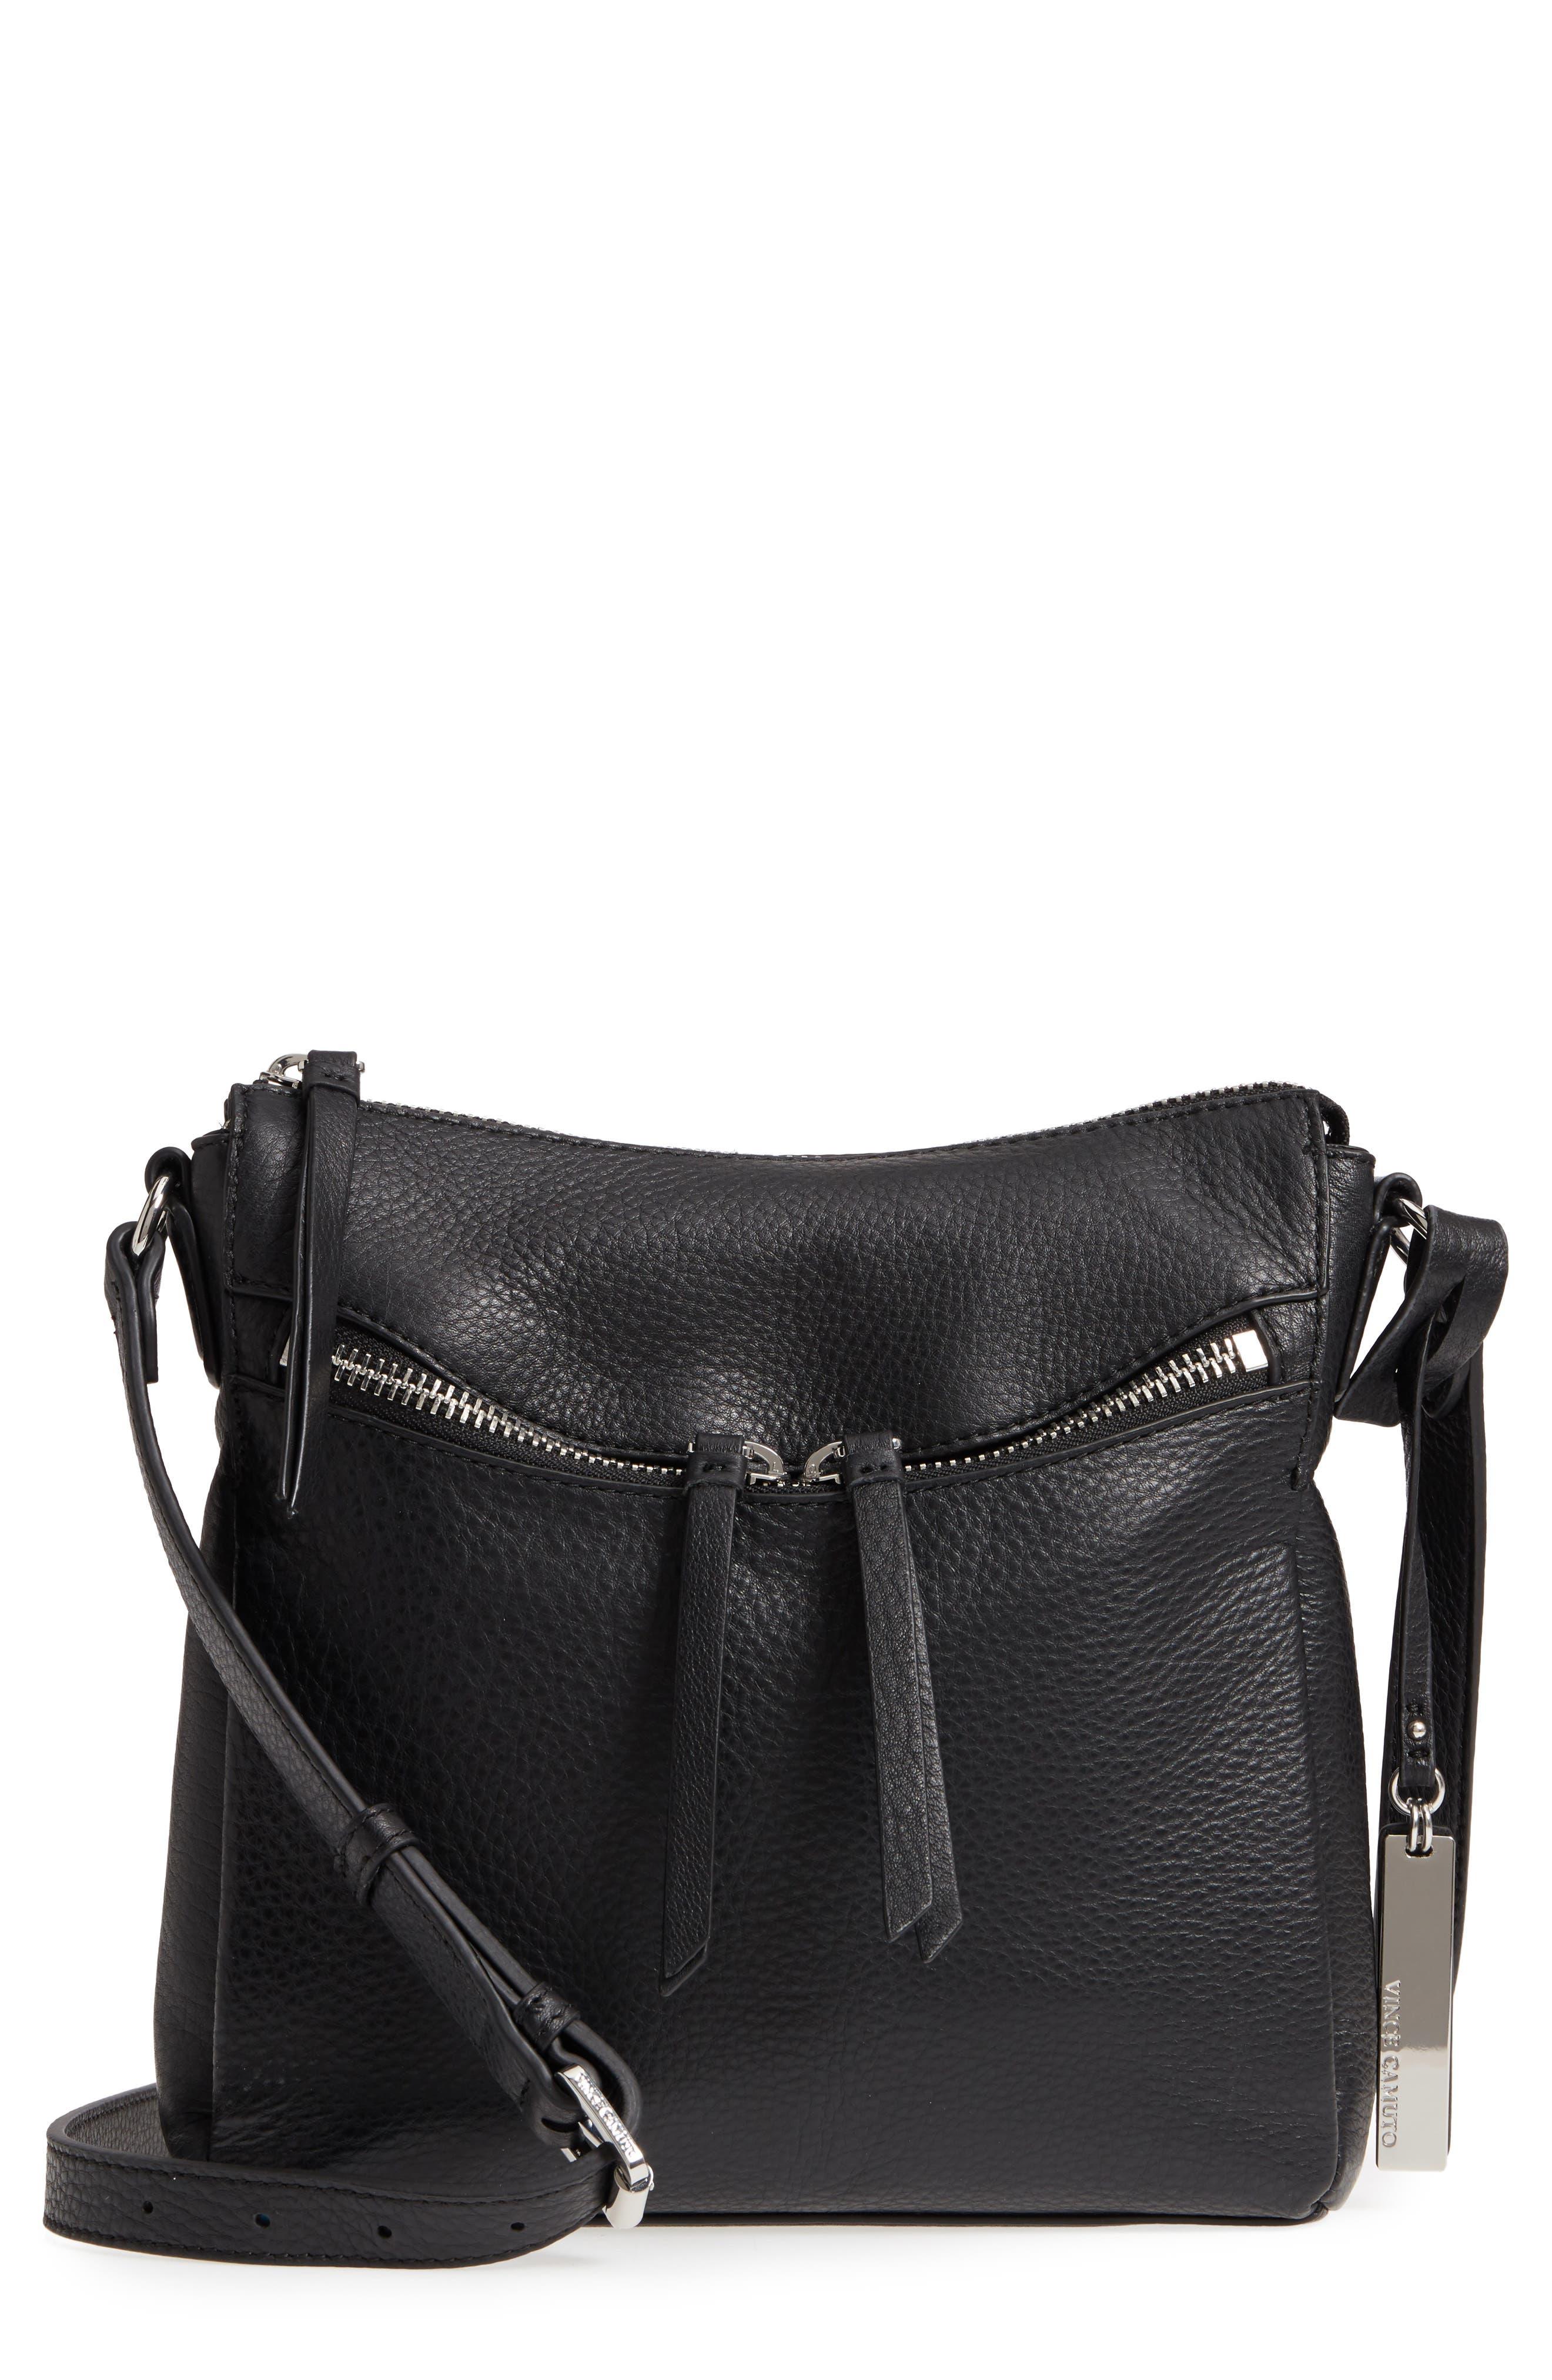 Staja Leather Crossbody Bag,                             Main thumbnail 1, color,                             Nero